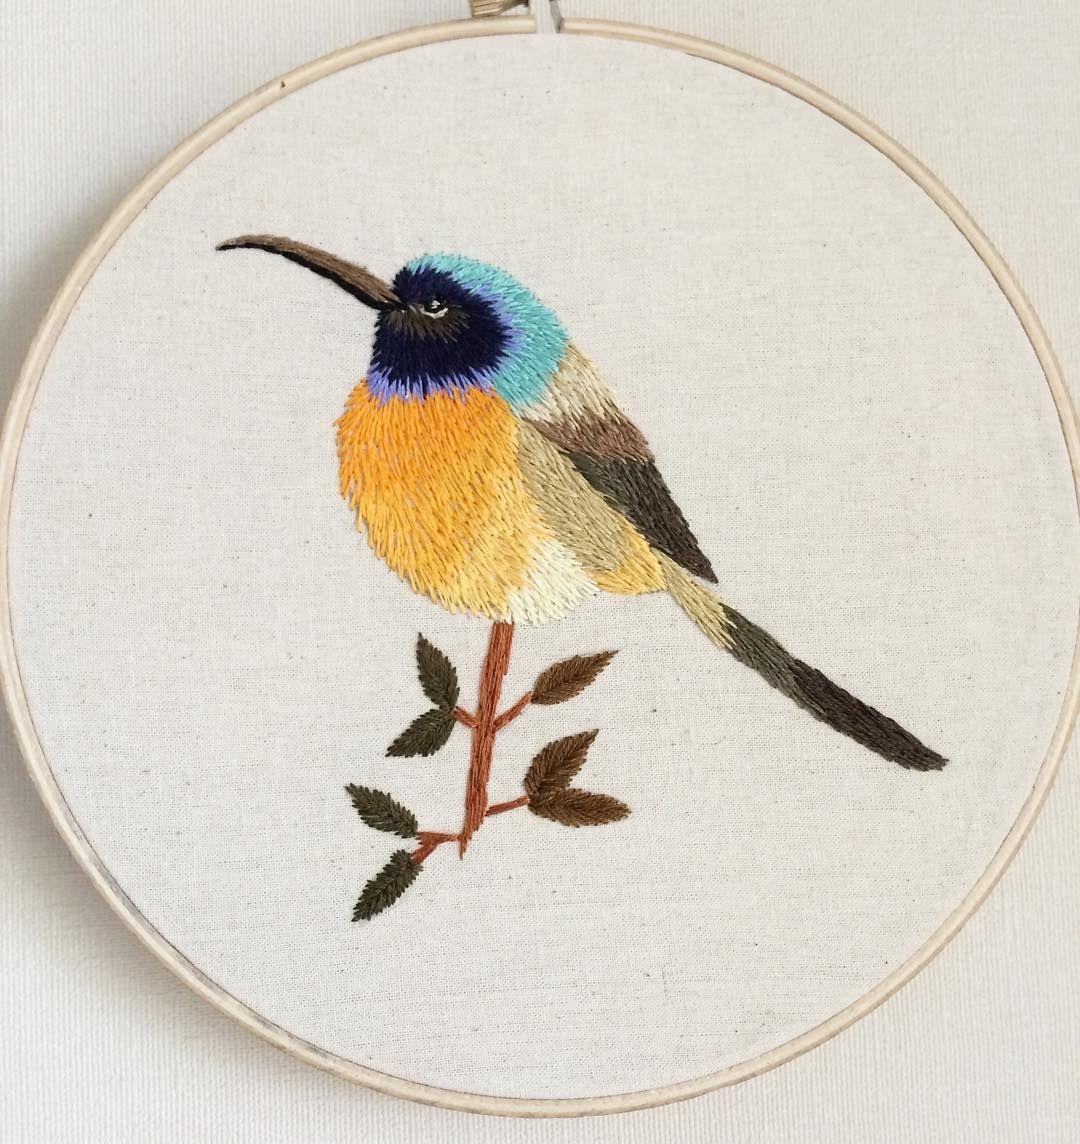 Sundbird Pecho Naranjo, pájaro sudafricano